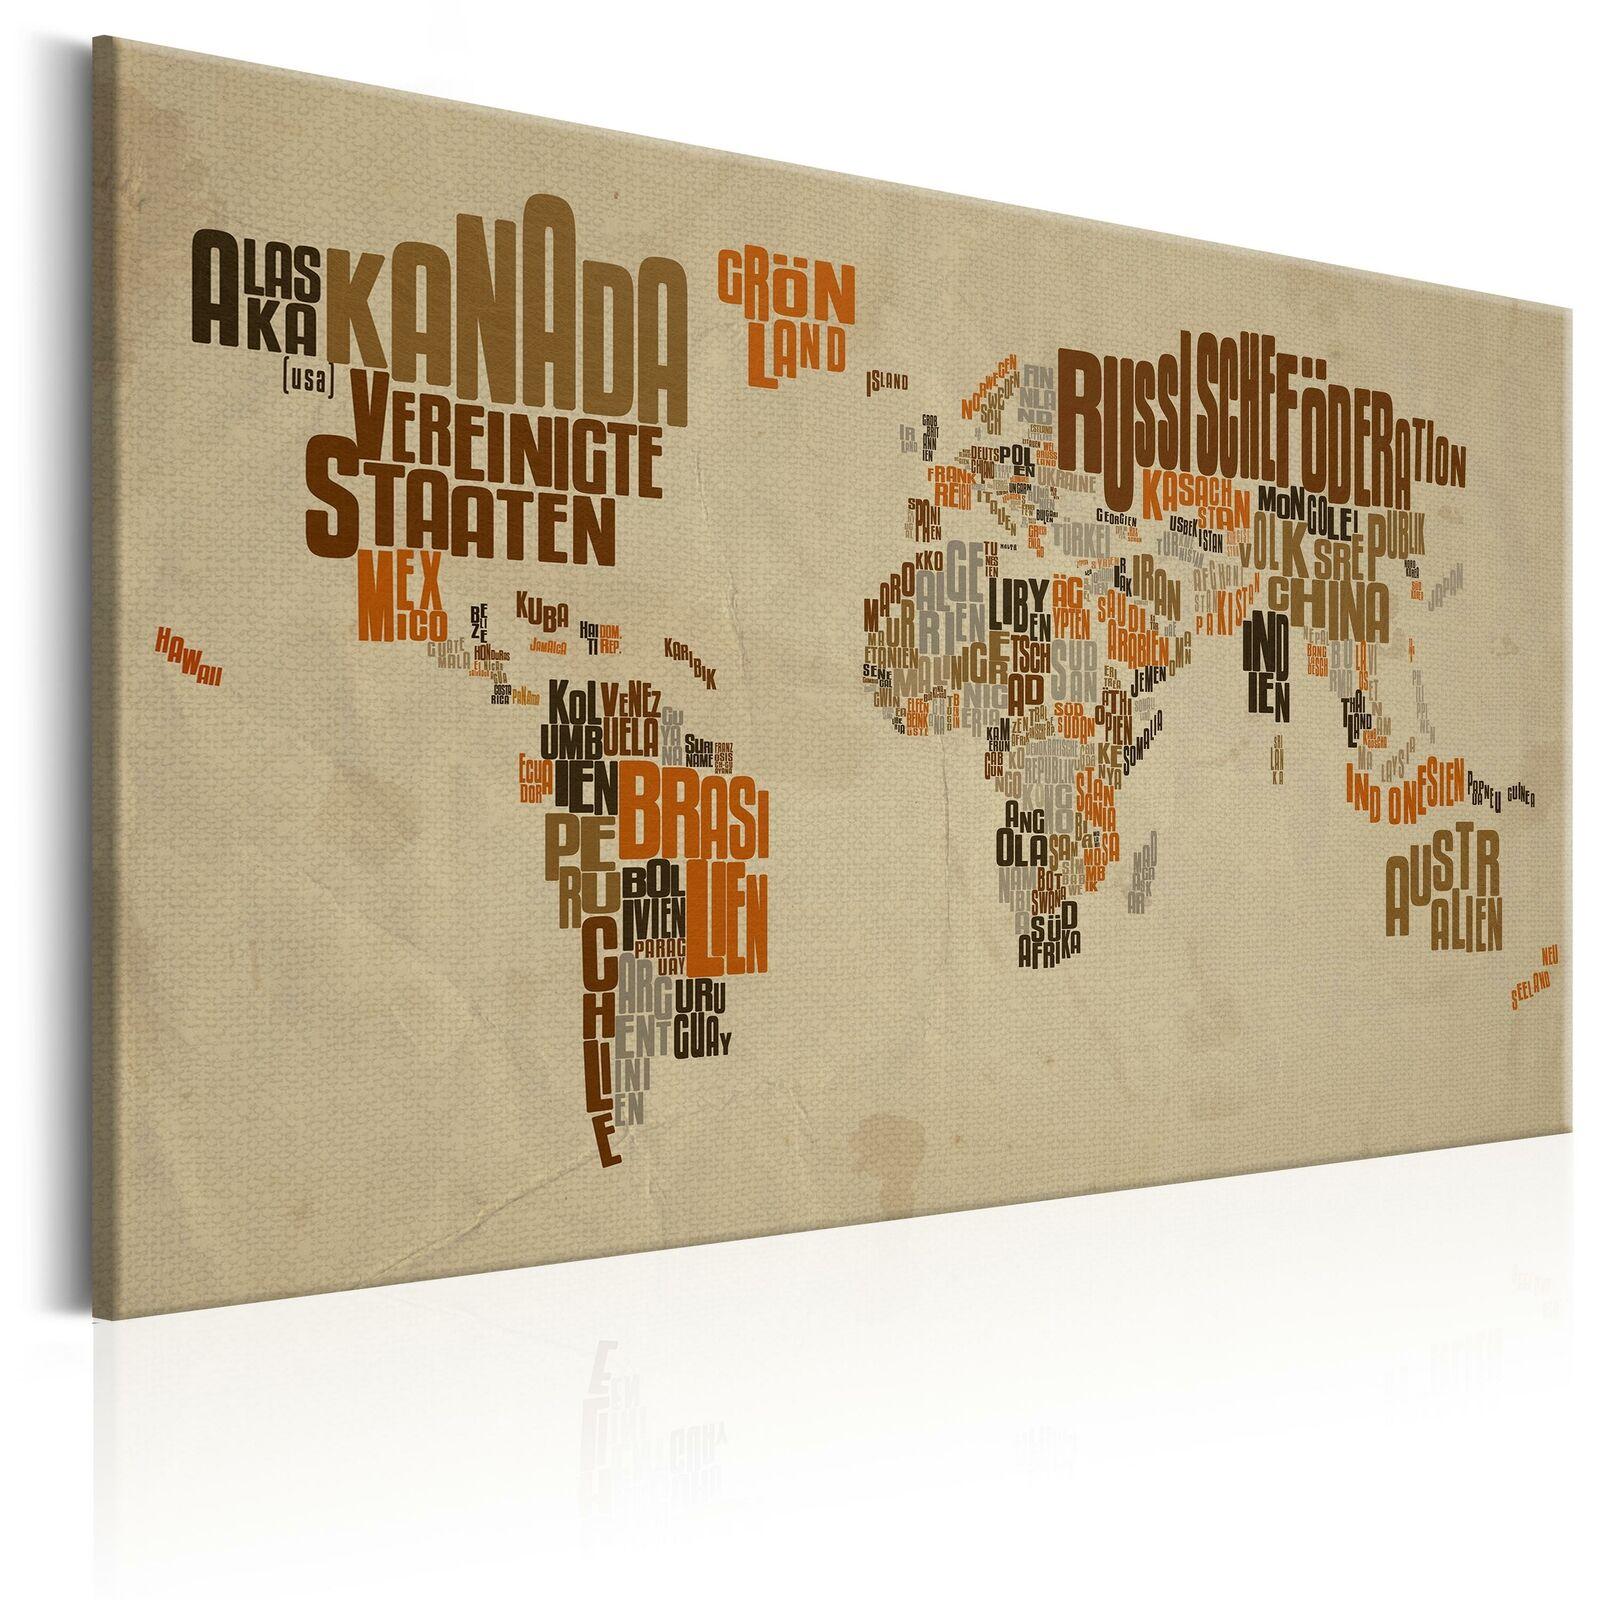 Wandbilder xxl Weltkarte Bilder auf Vlies Leinwand Leinwandbilder k-C-0020-b-a